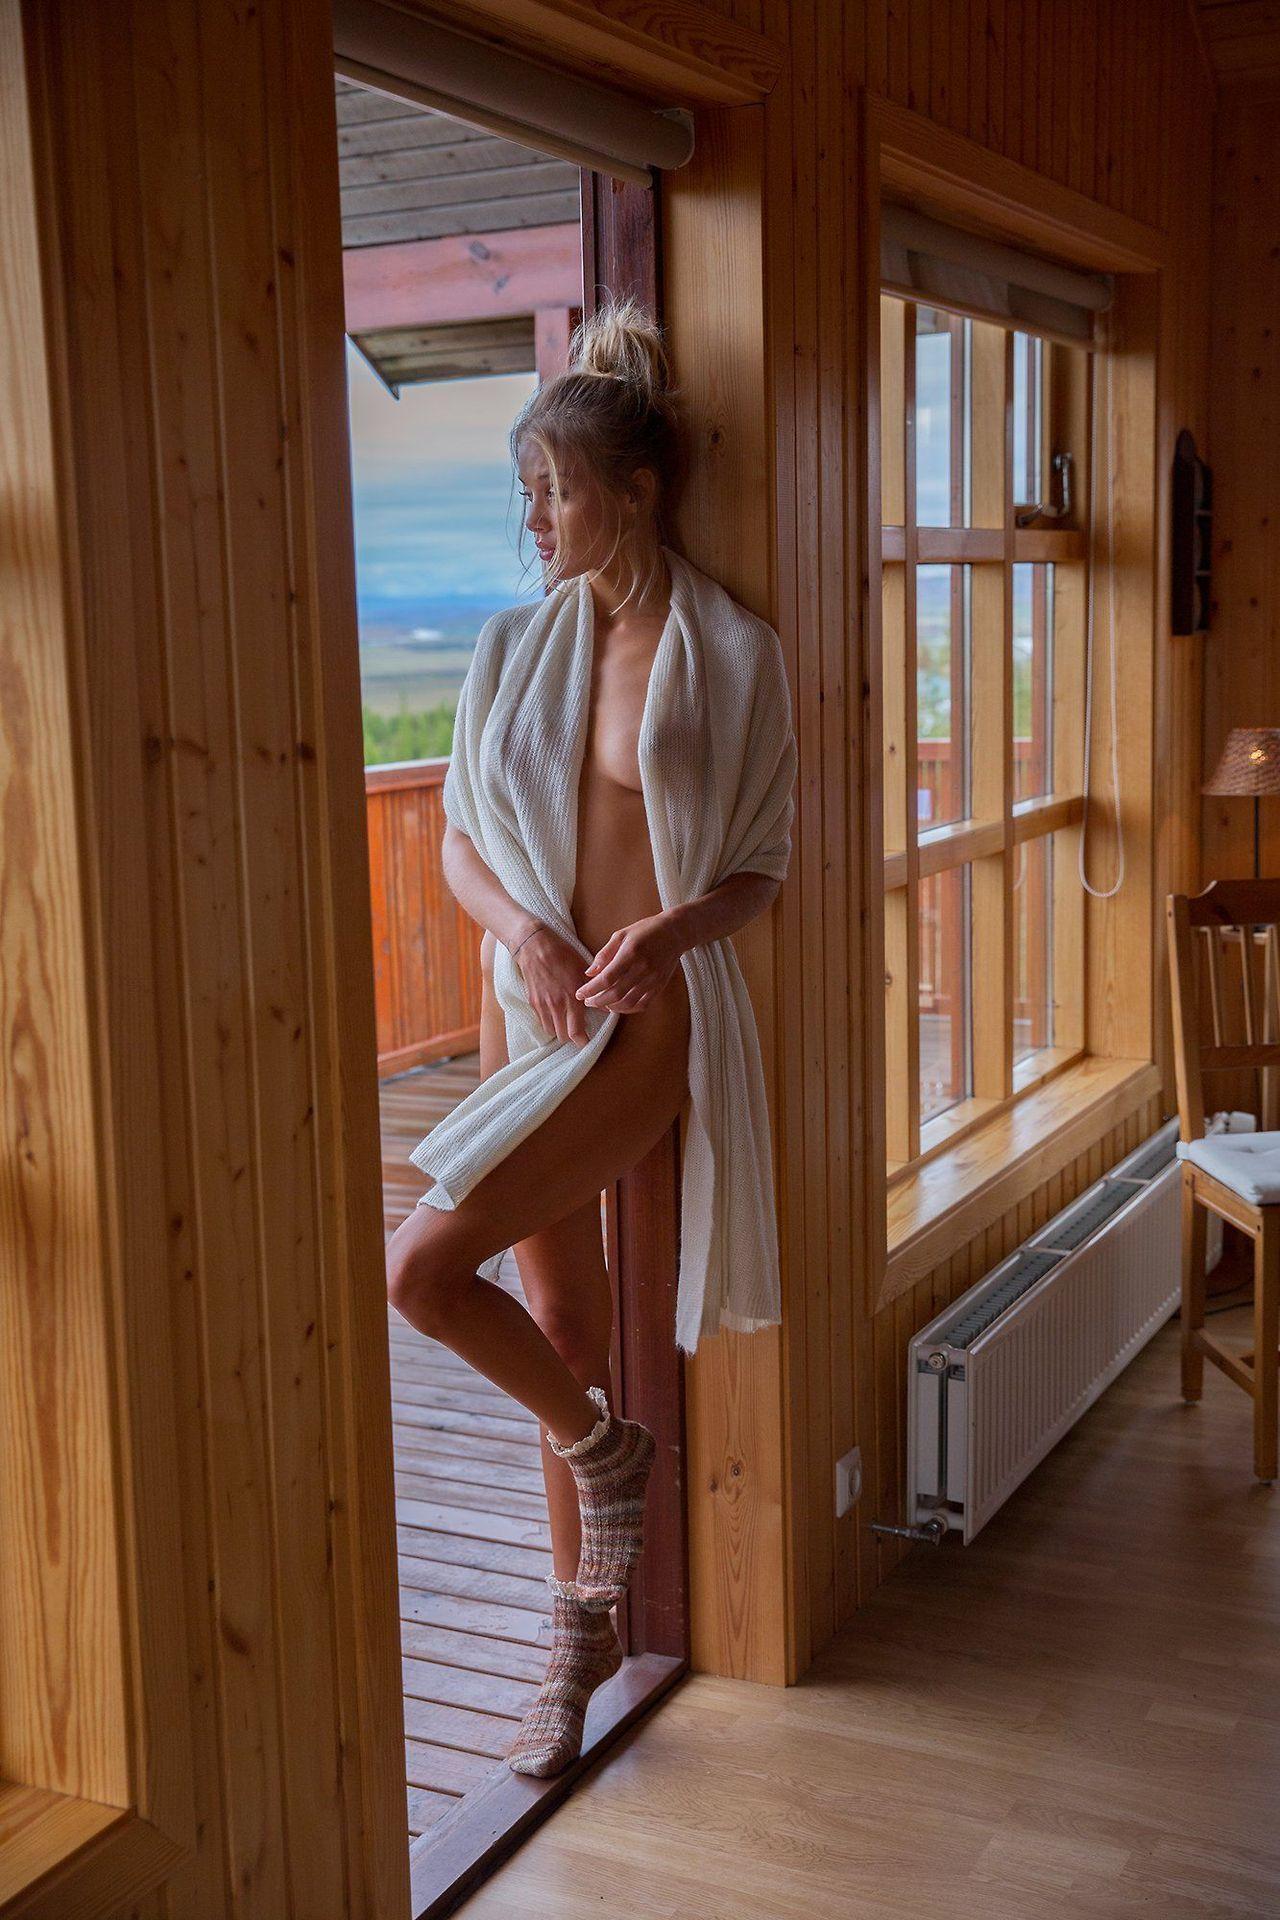 Hacked Allie Leggett naked (92 foto and video), Topless, Sideboobs, Instagram, swimsuit 2006